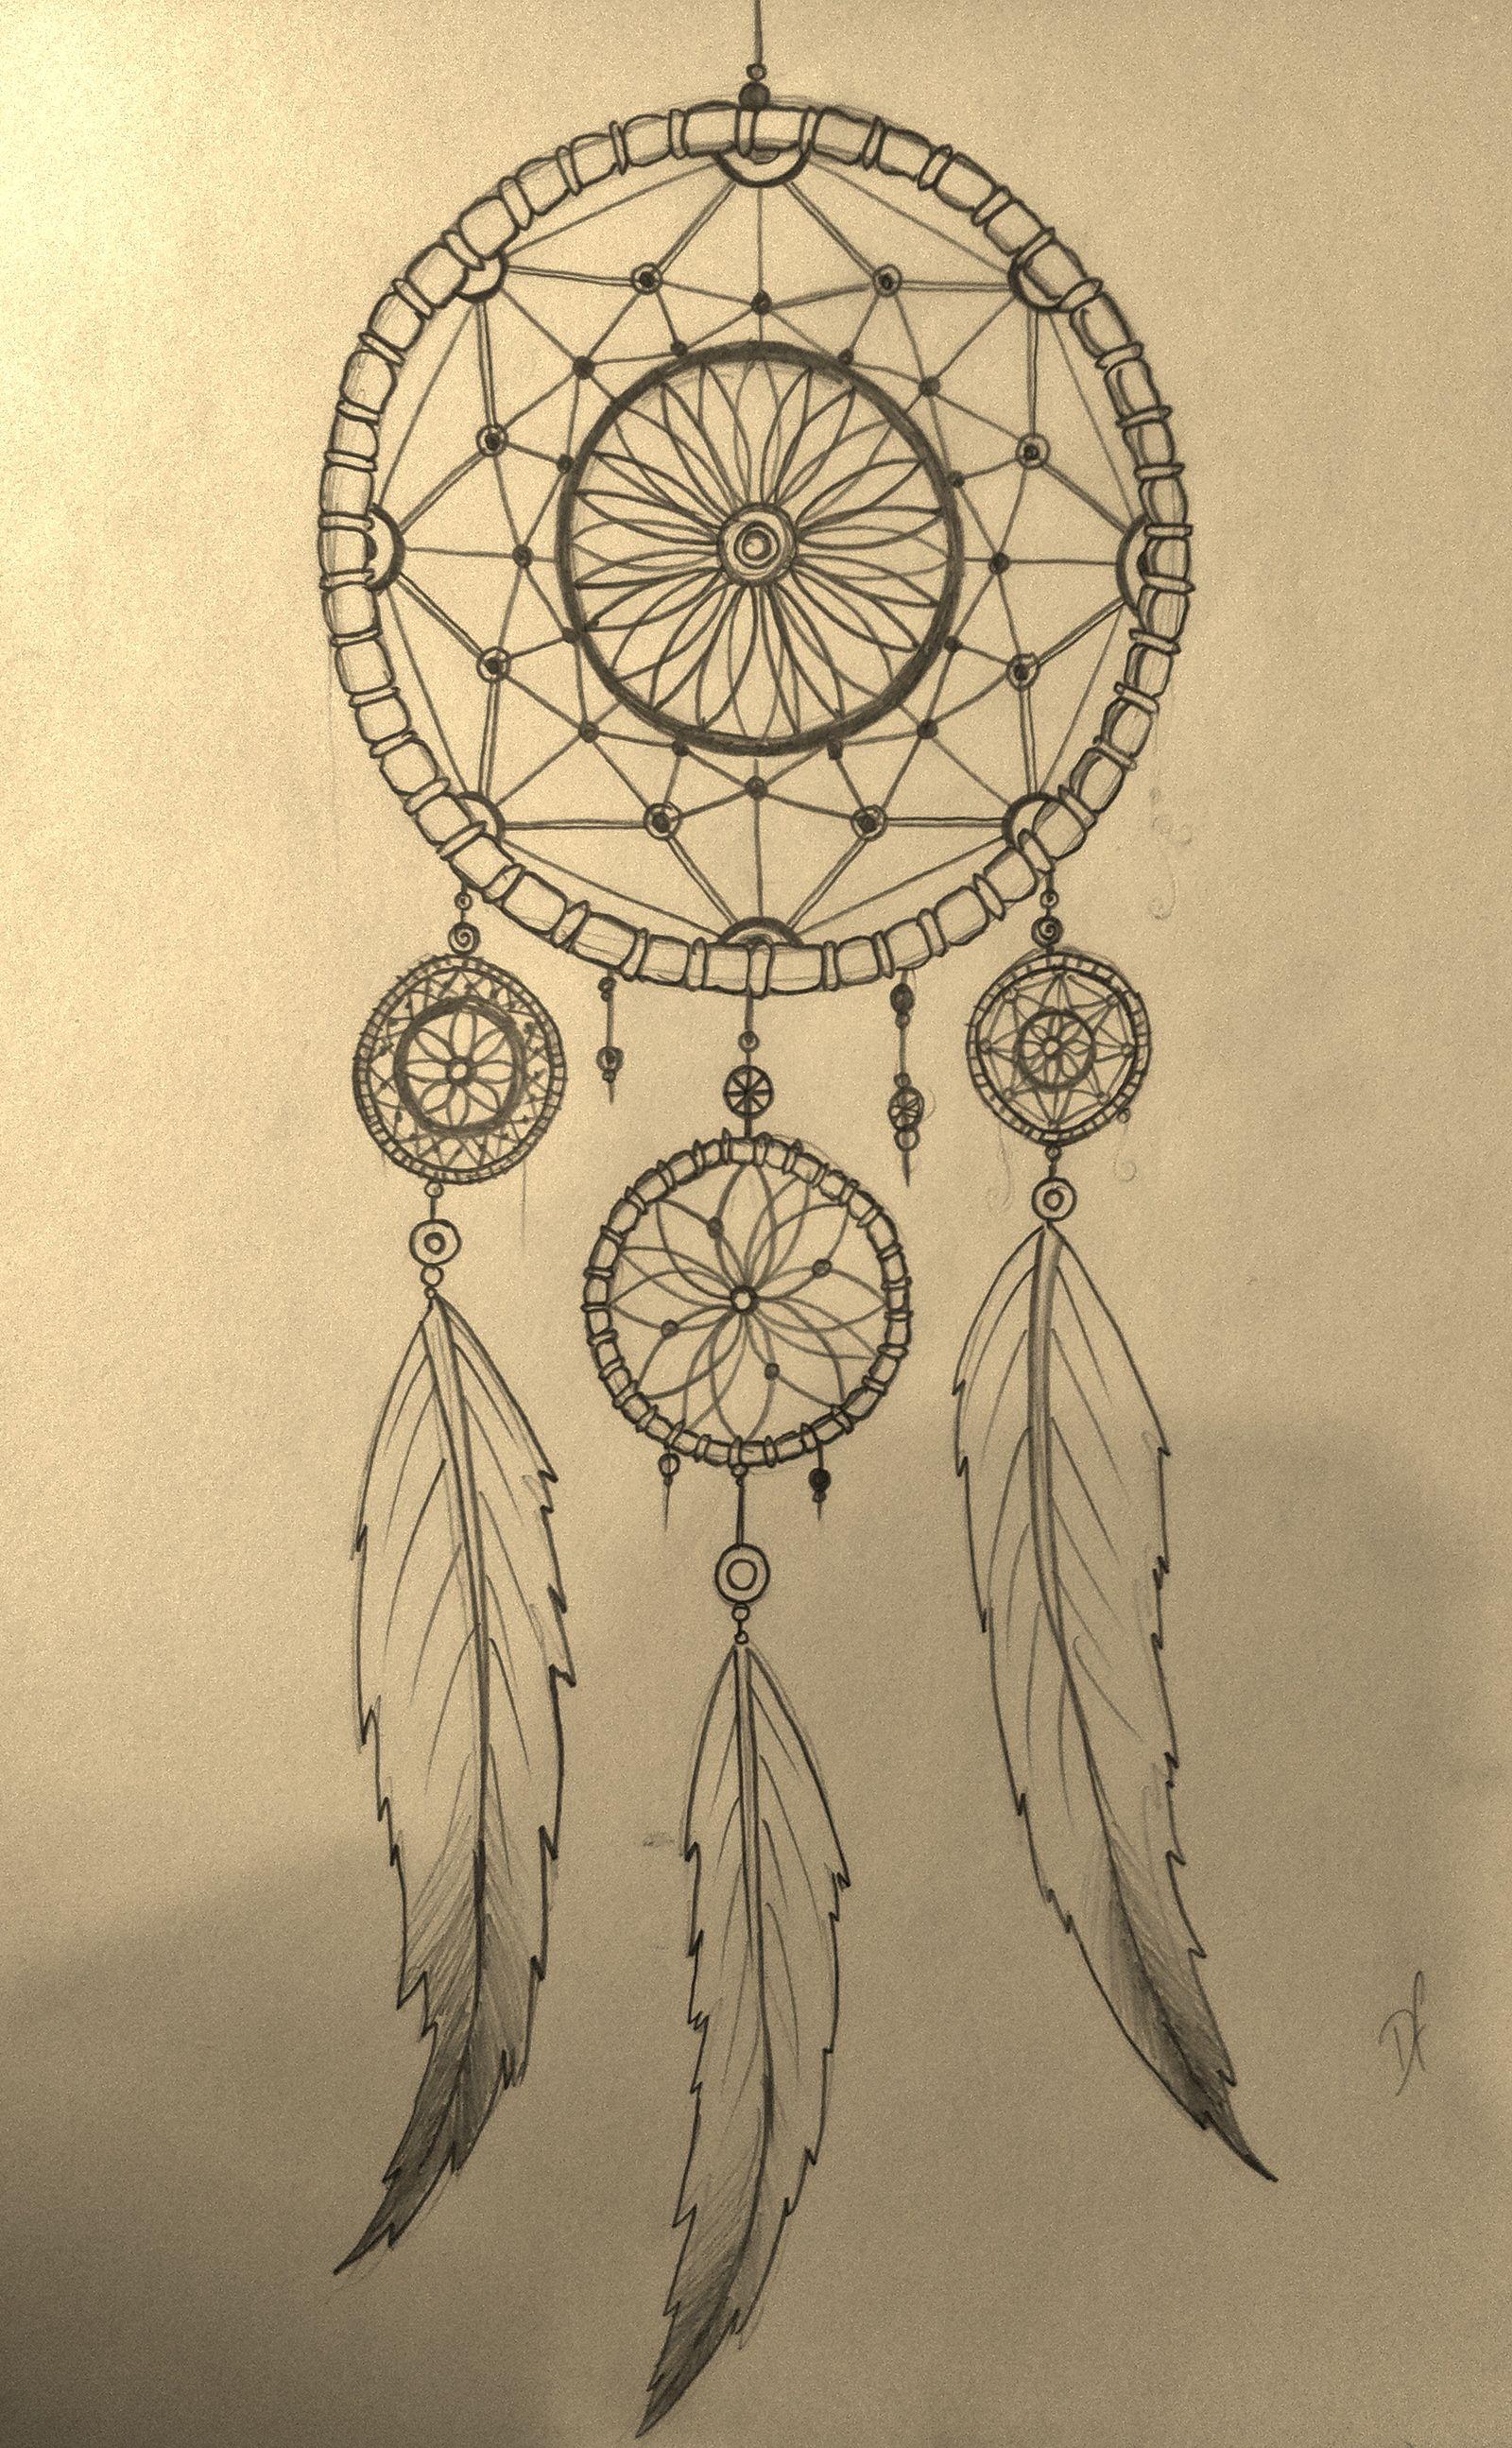 Https Www Bing Com Images Search Q Dream Catcher Drawings Dreamcatcher Drawing Creative Drawing Dream Catcher Art